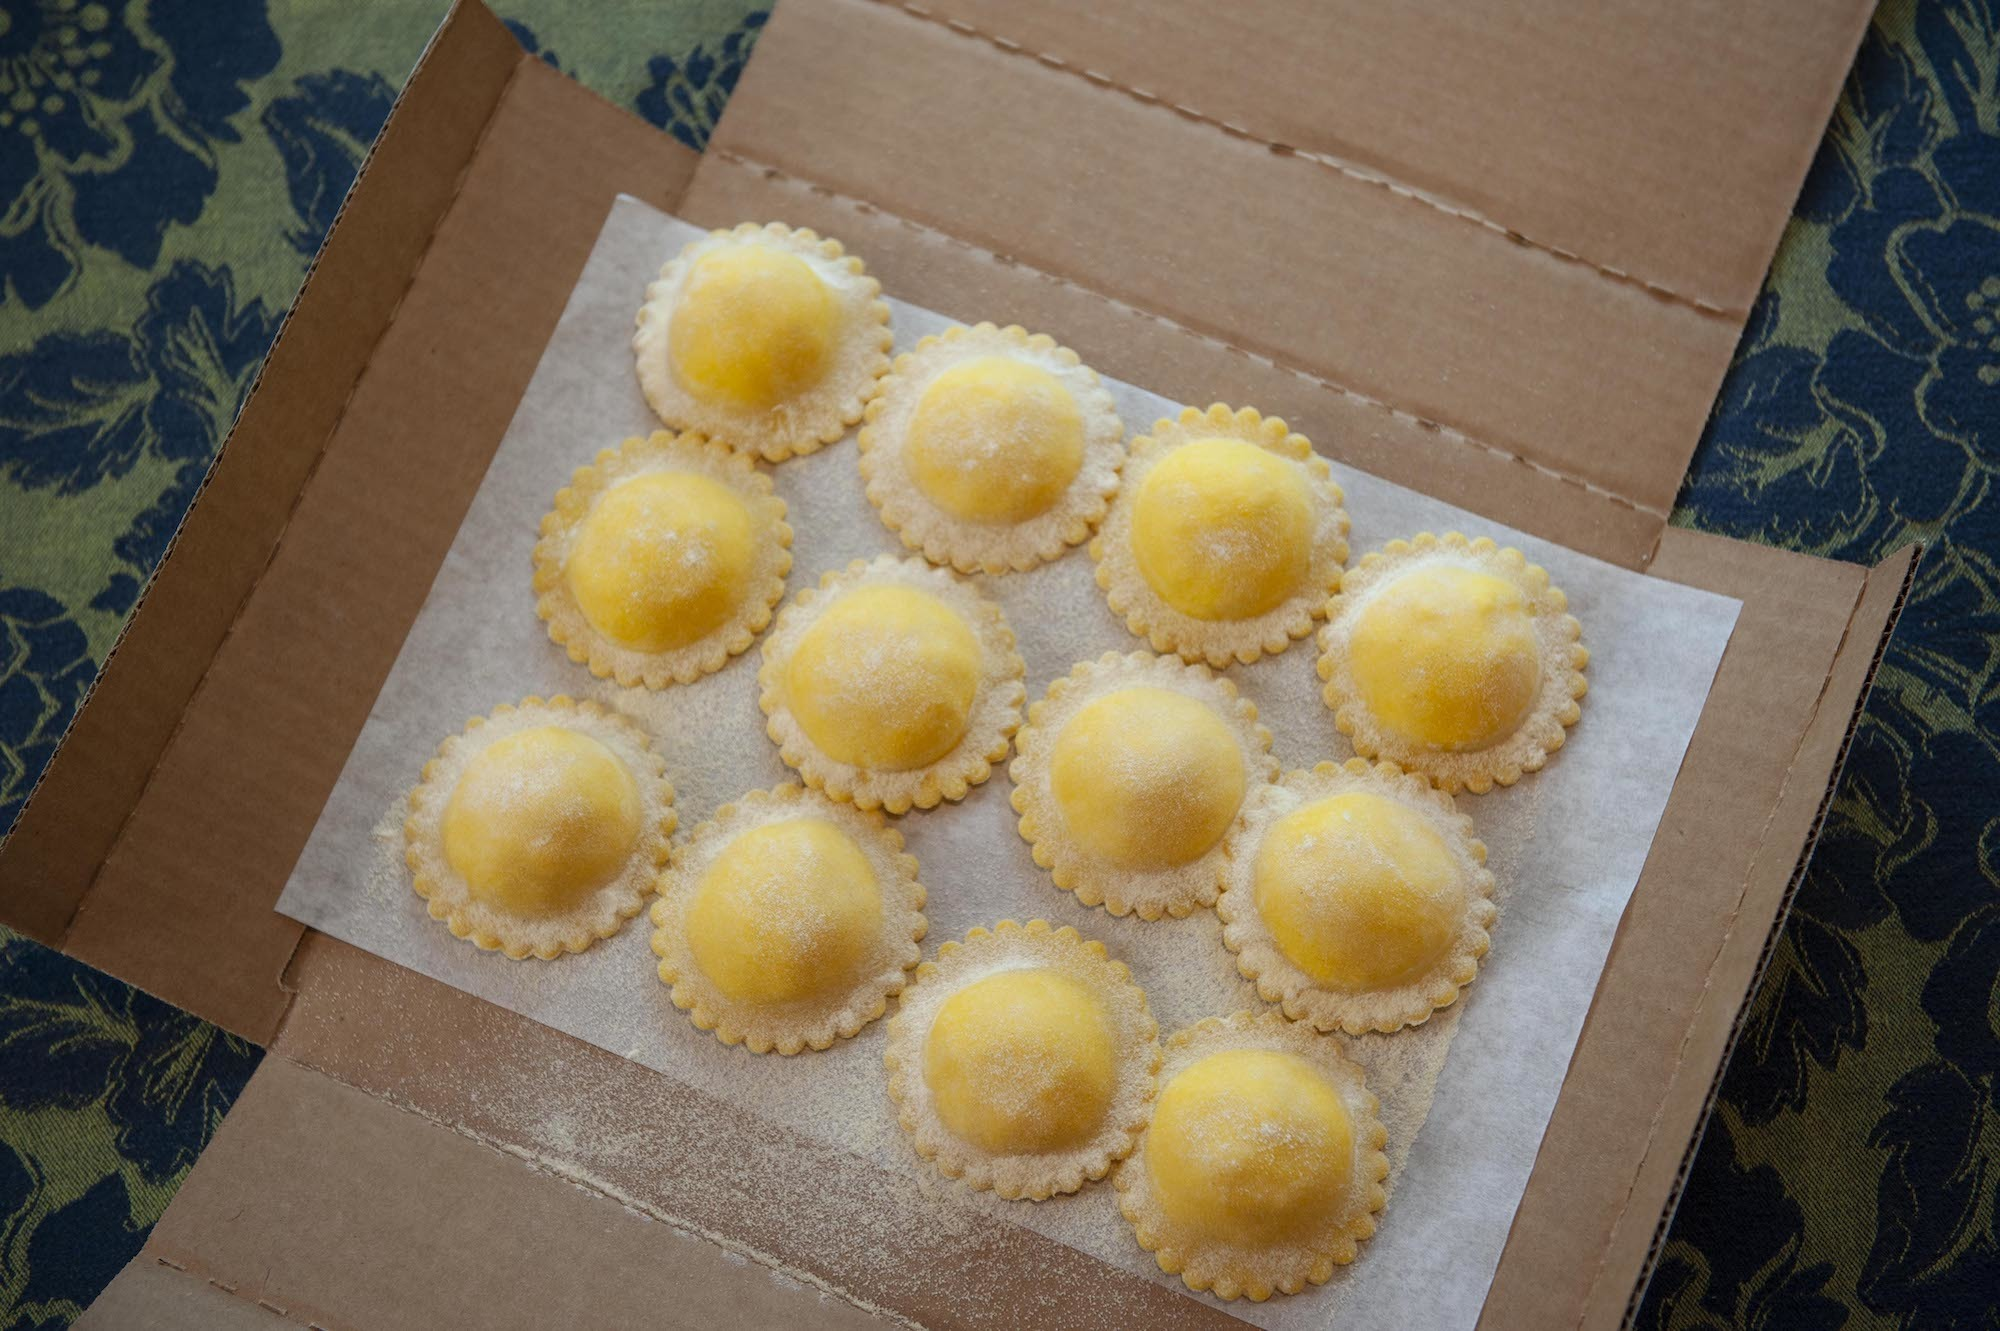 monteverde, pasta, ravioli, italian, food